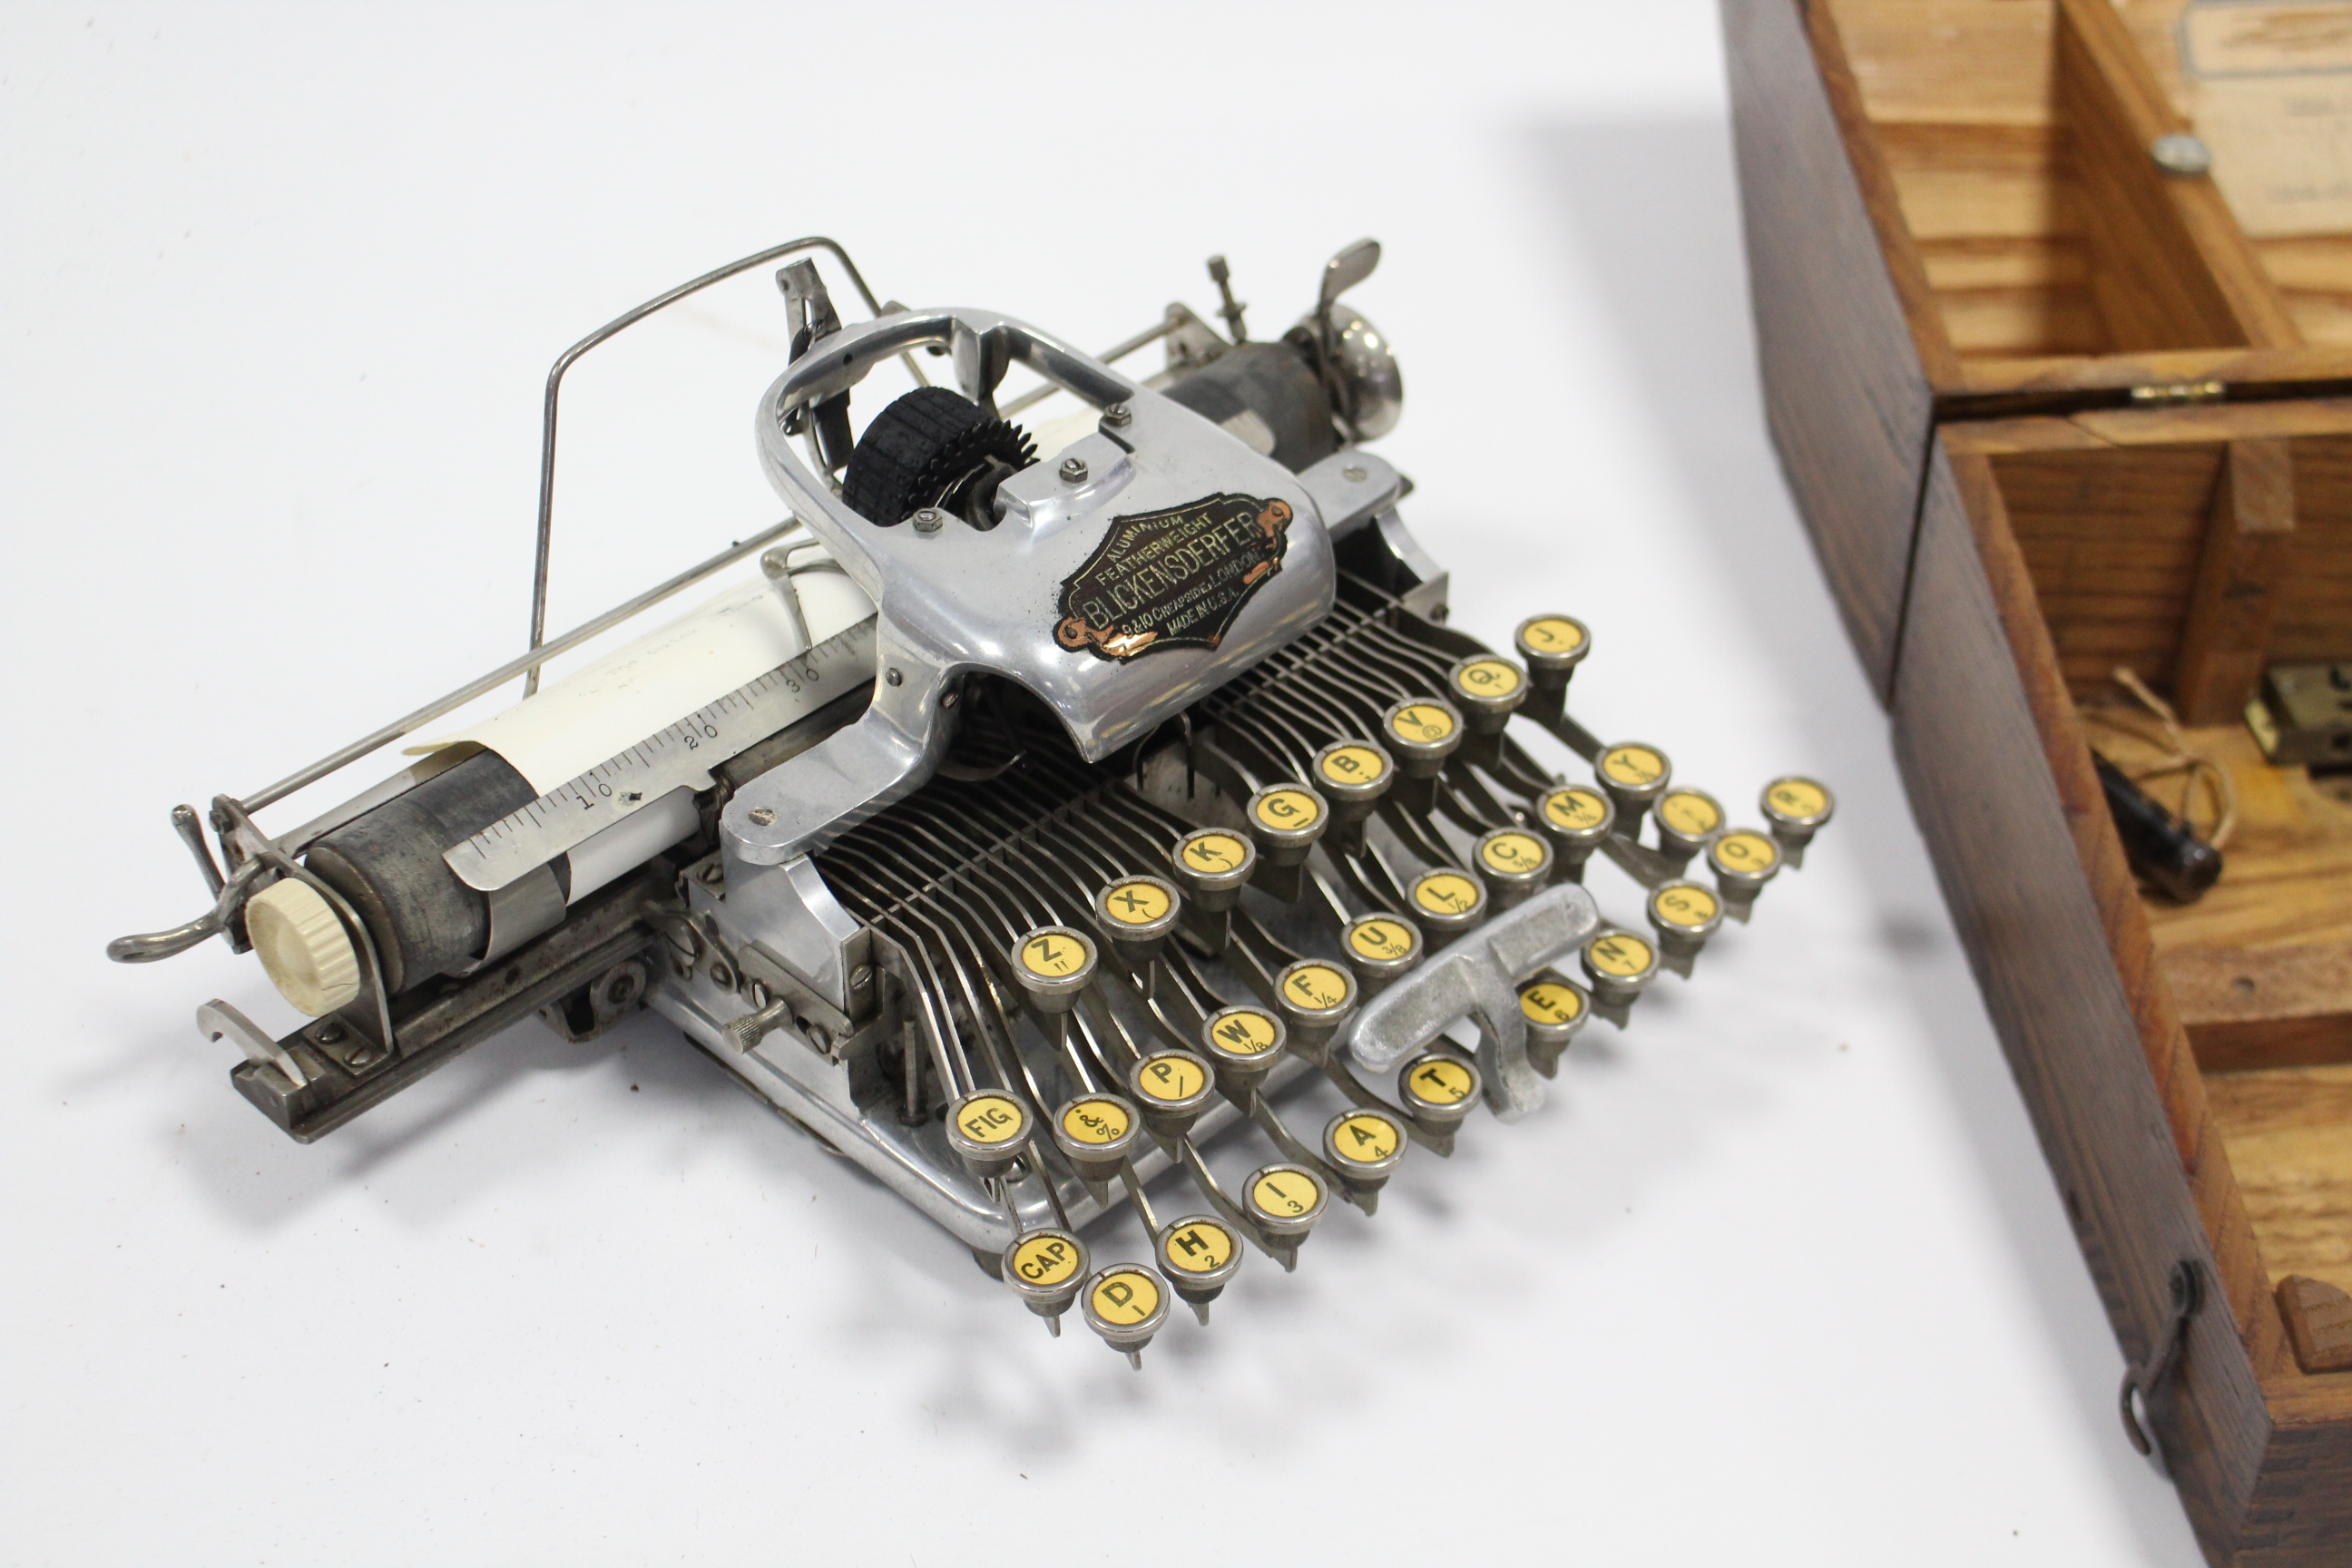 Lot 40 - An American early/mid-20th century Blickensderfer aluminium featherweight portable typewriter,